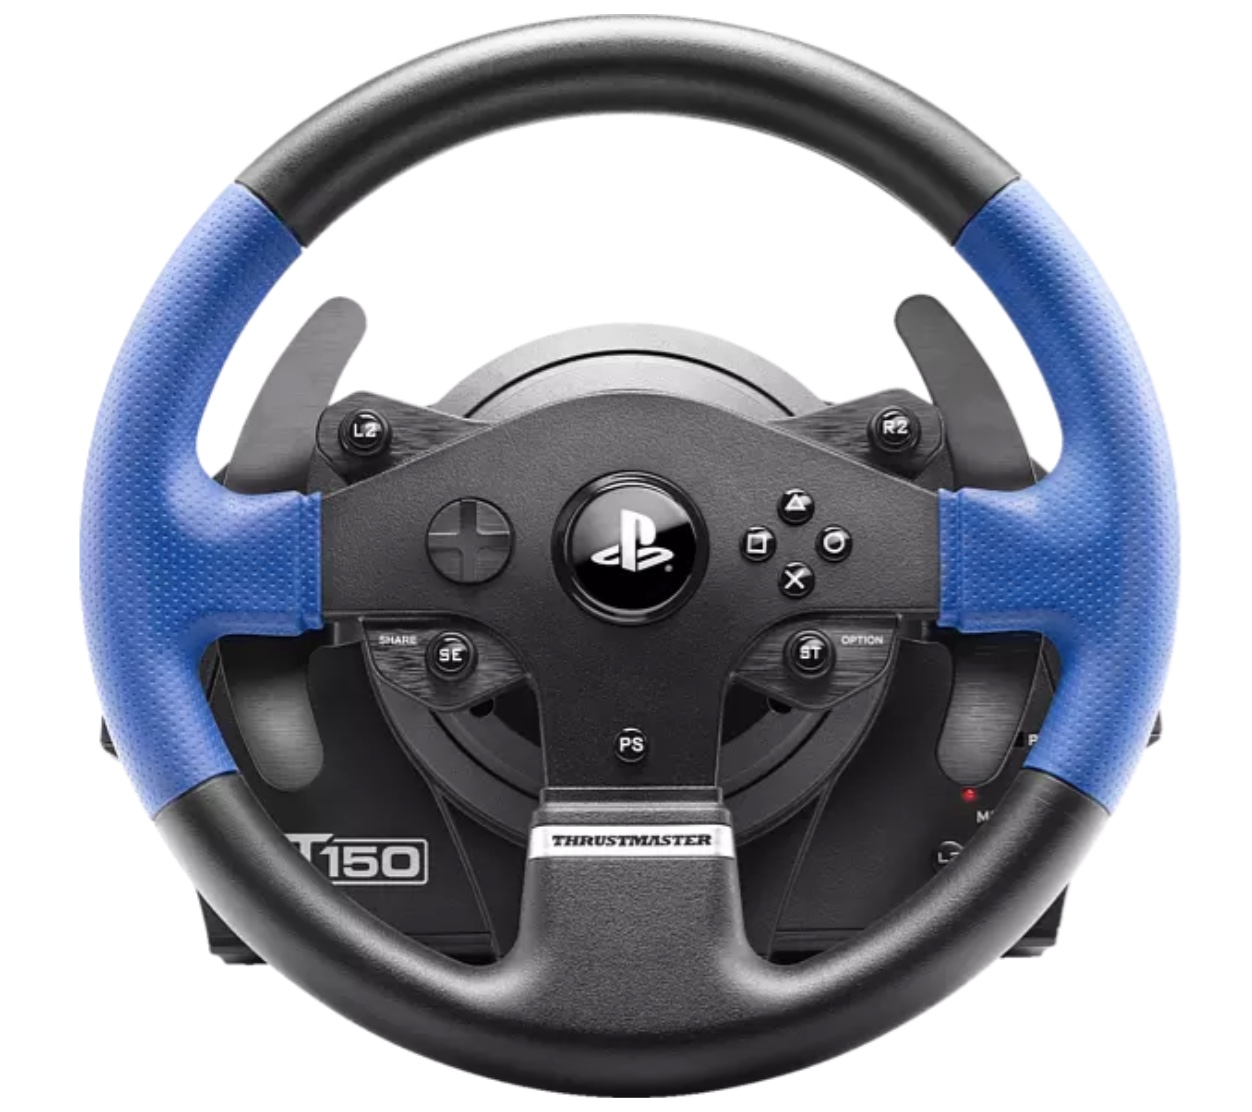 THRUSTMASTER T150 RS Lenkrad inkl. 2-Pedalset (für PS4 / PS3 / PC) für 119,99€ inkl. Versand